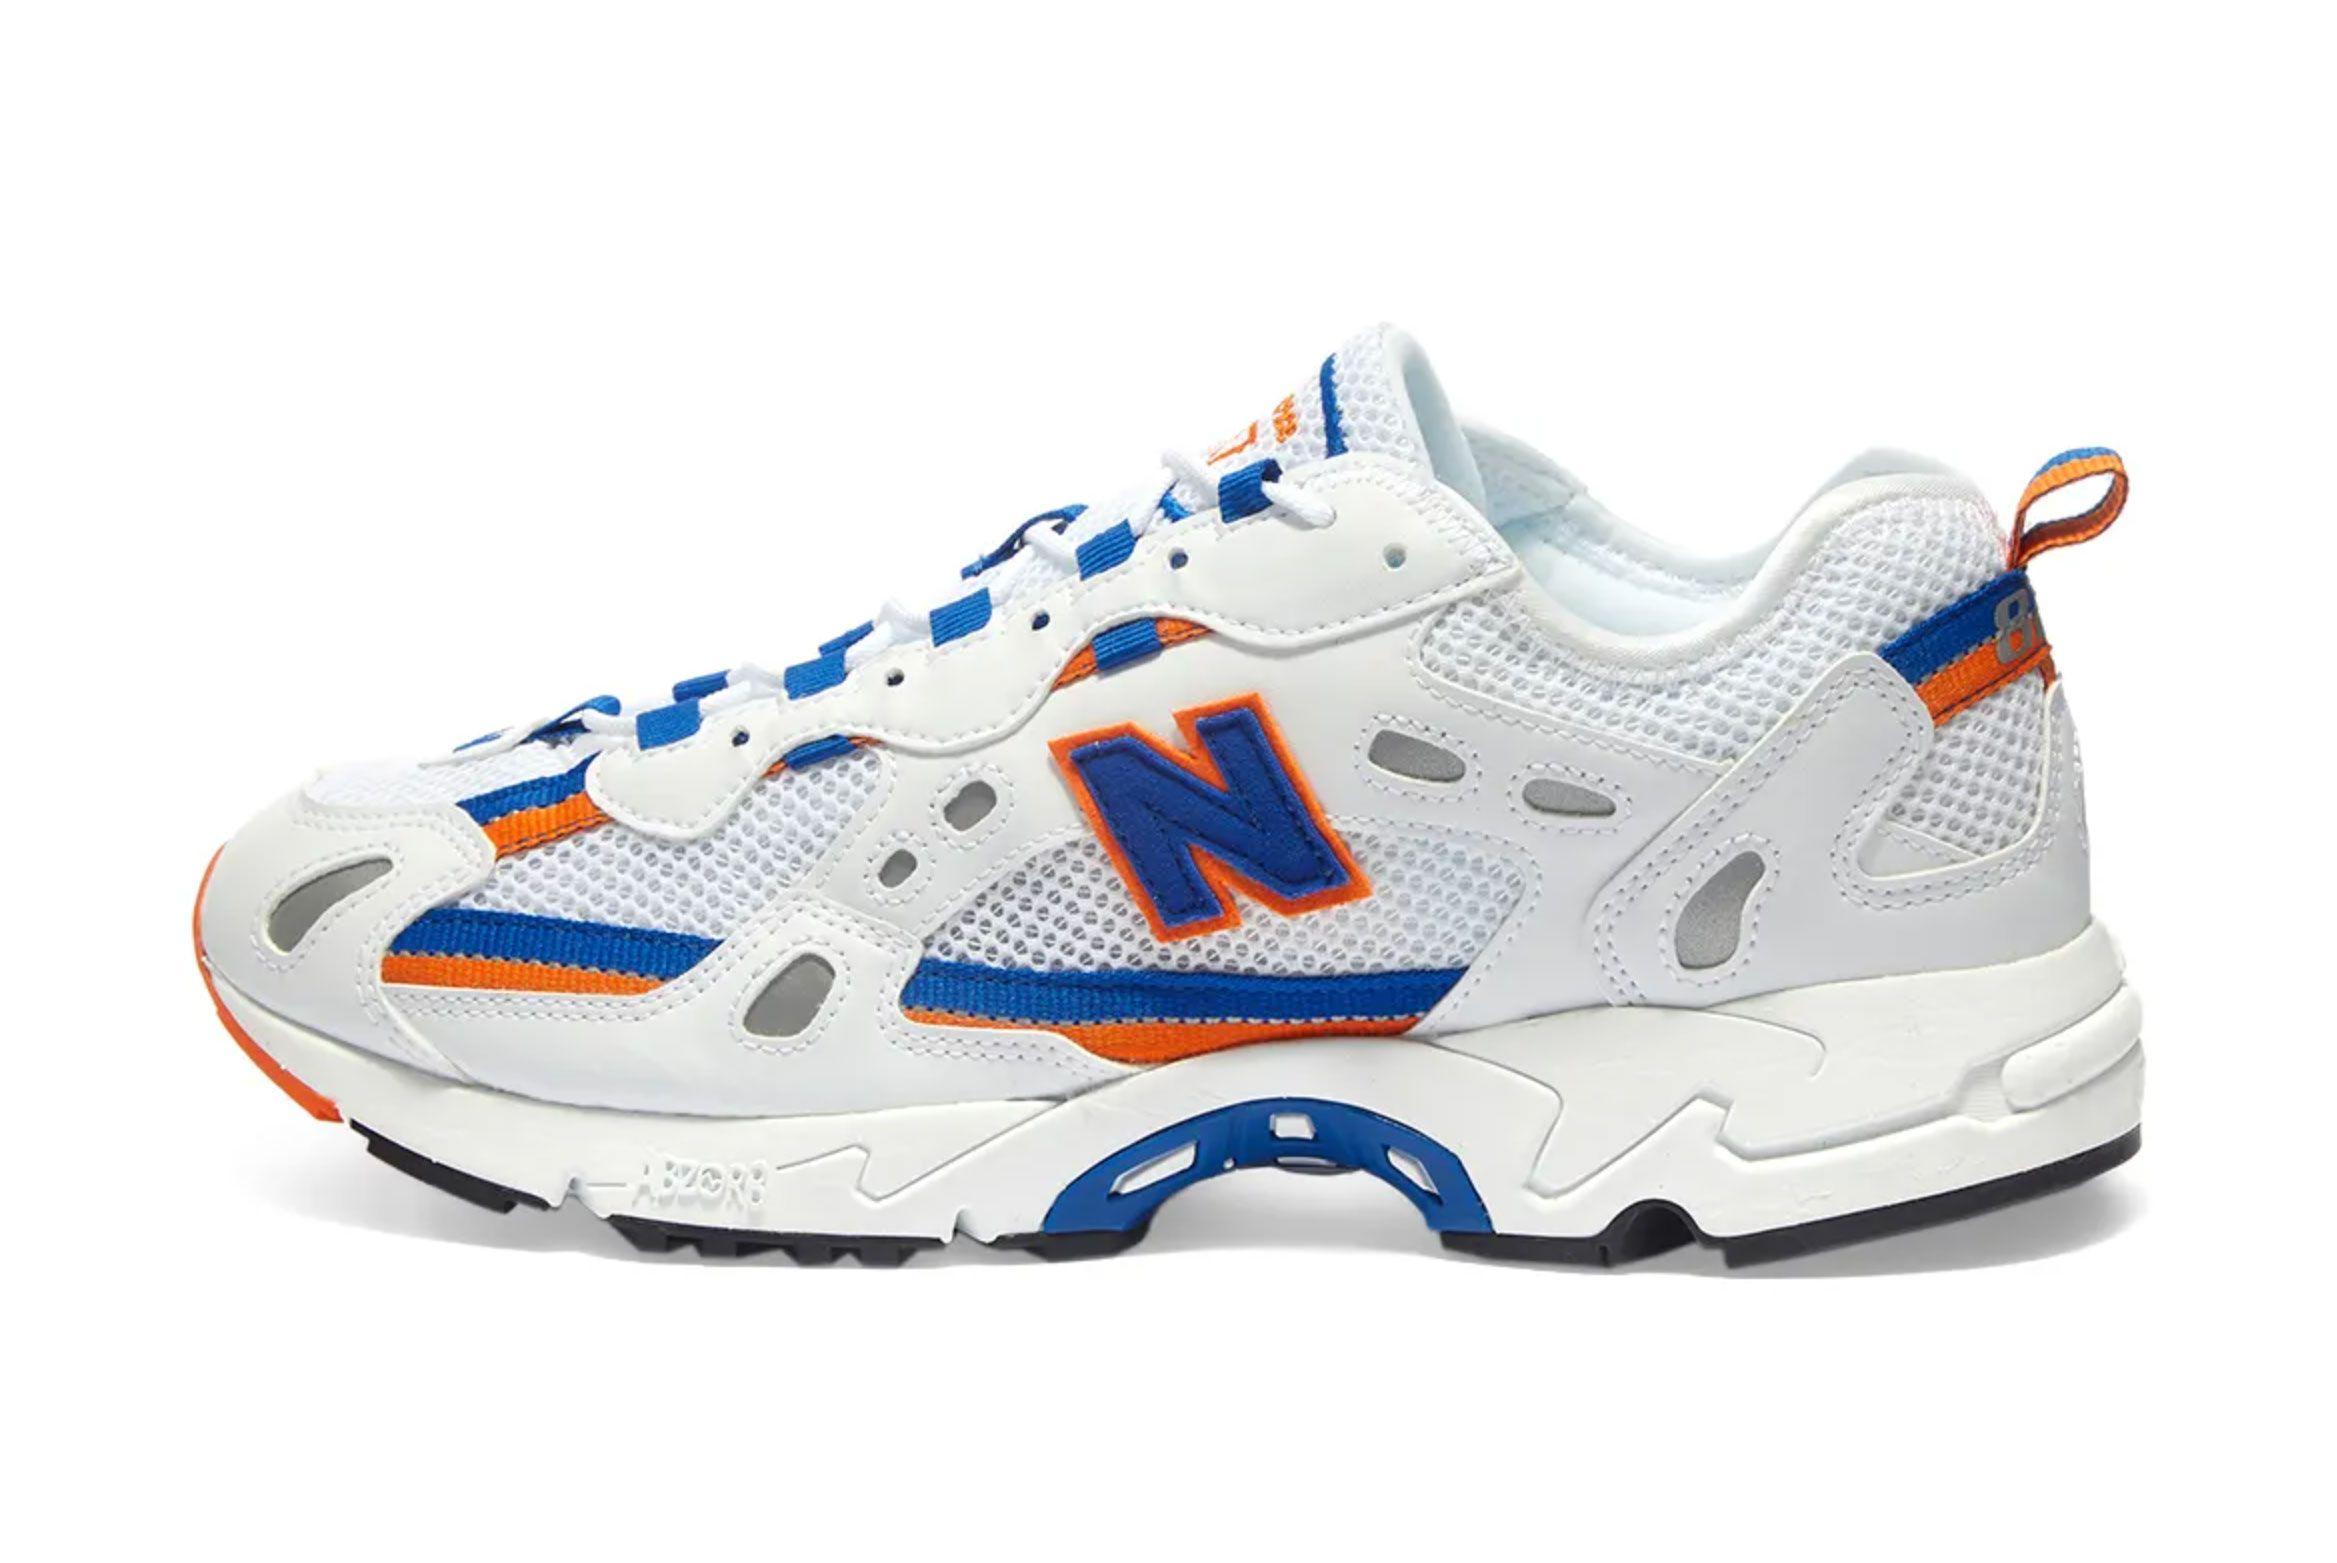 New Balance 827 (White/Royal/Orange)